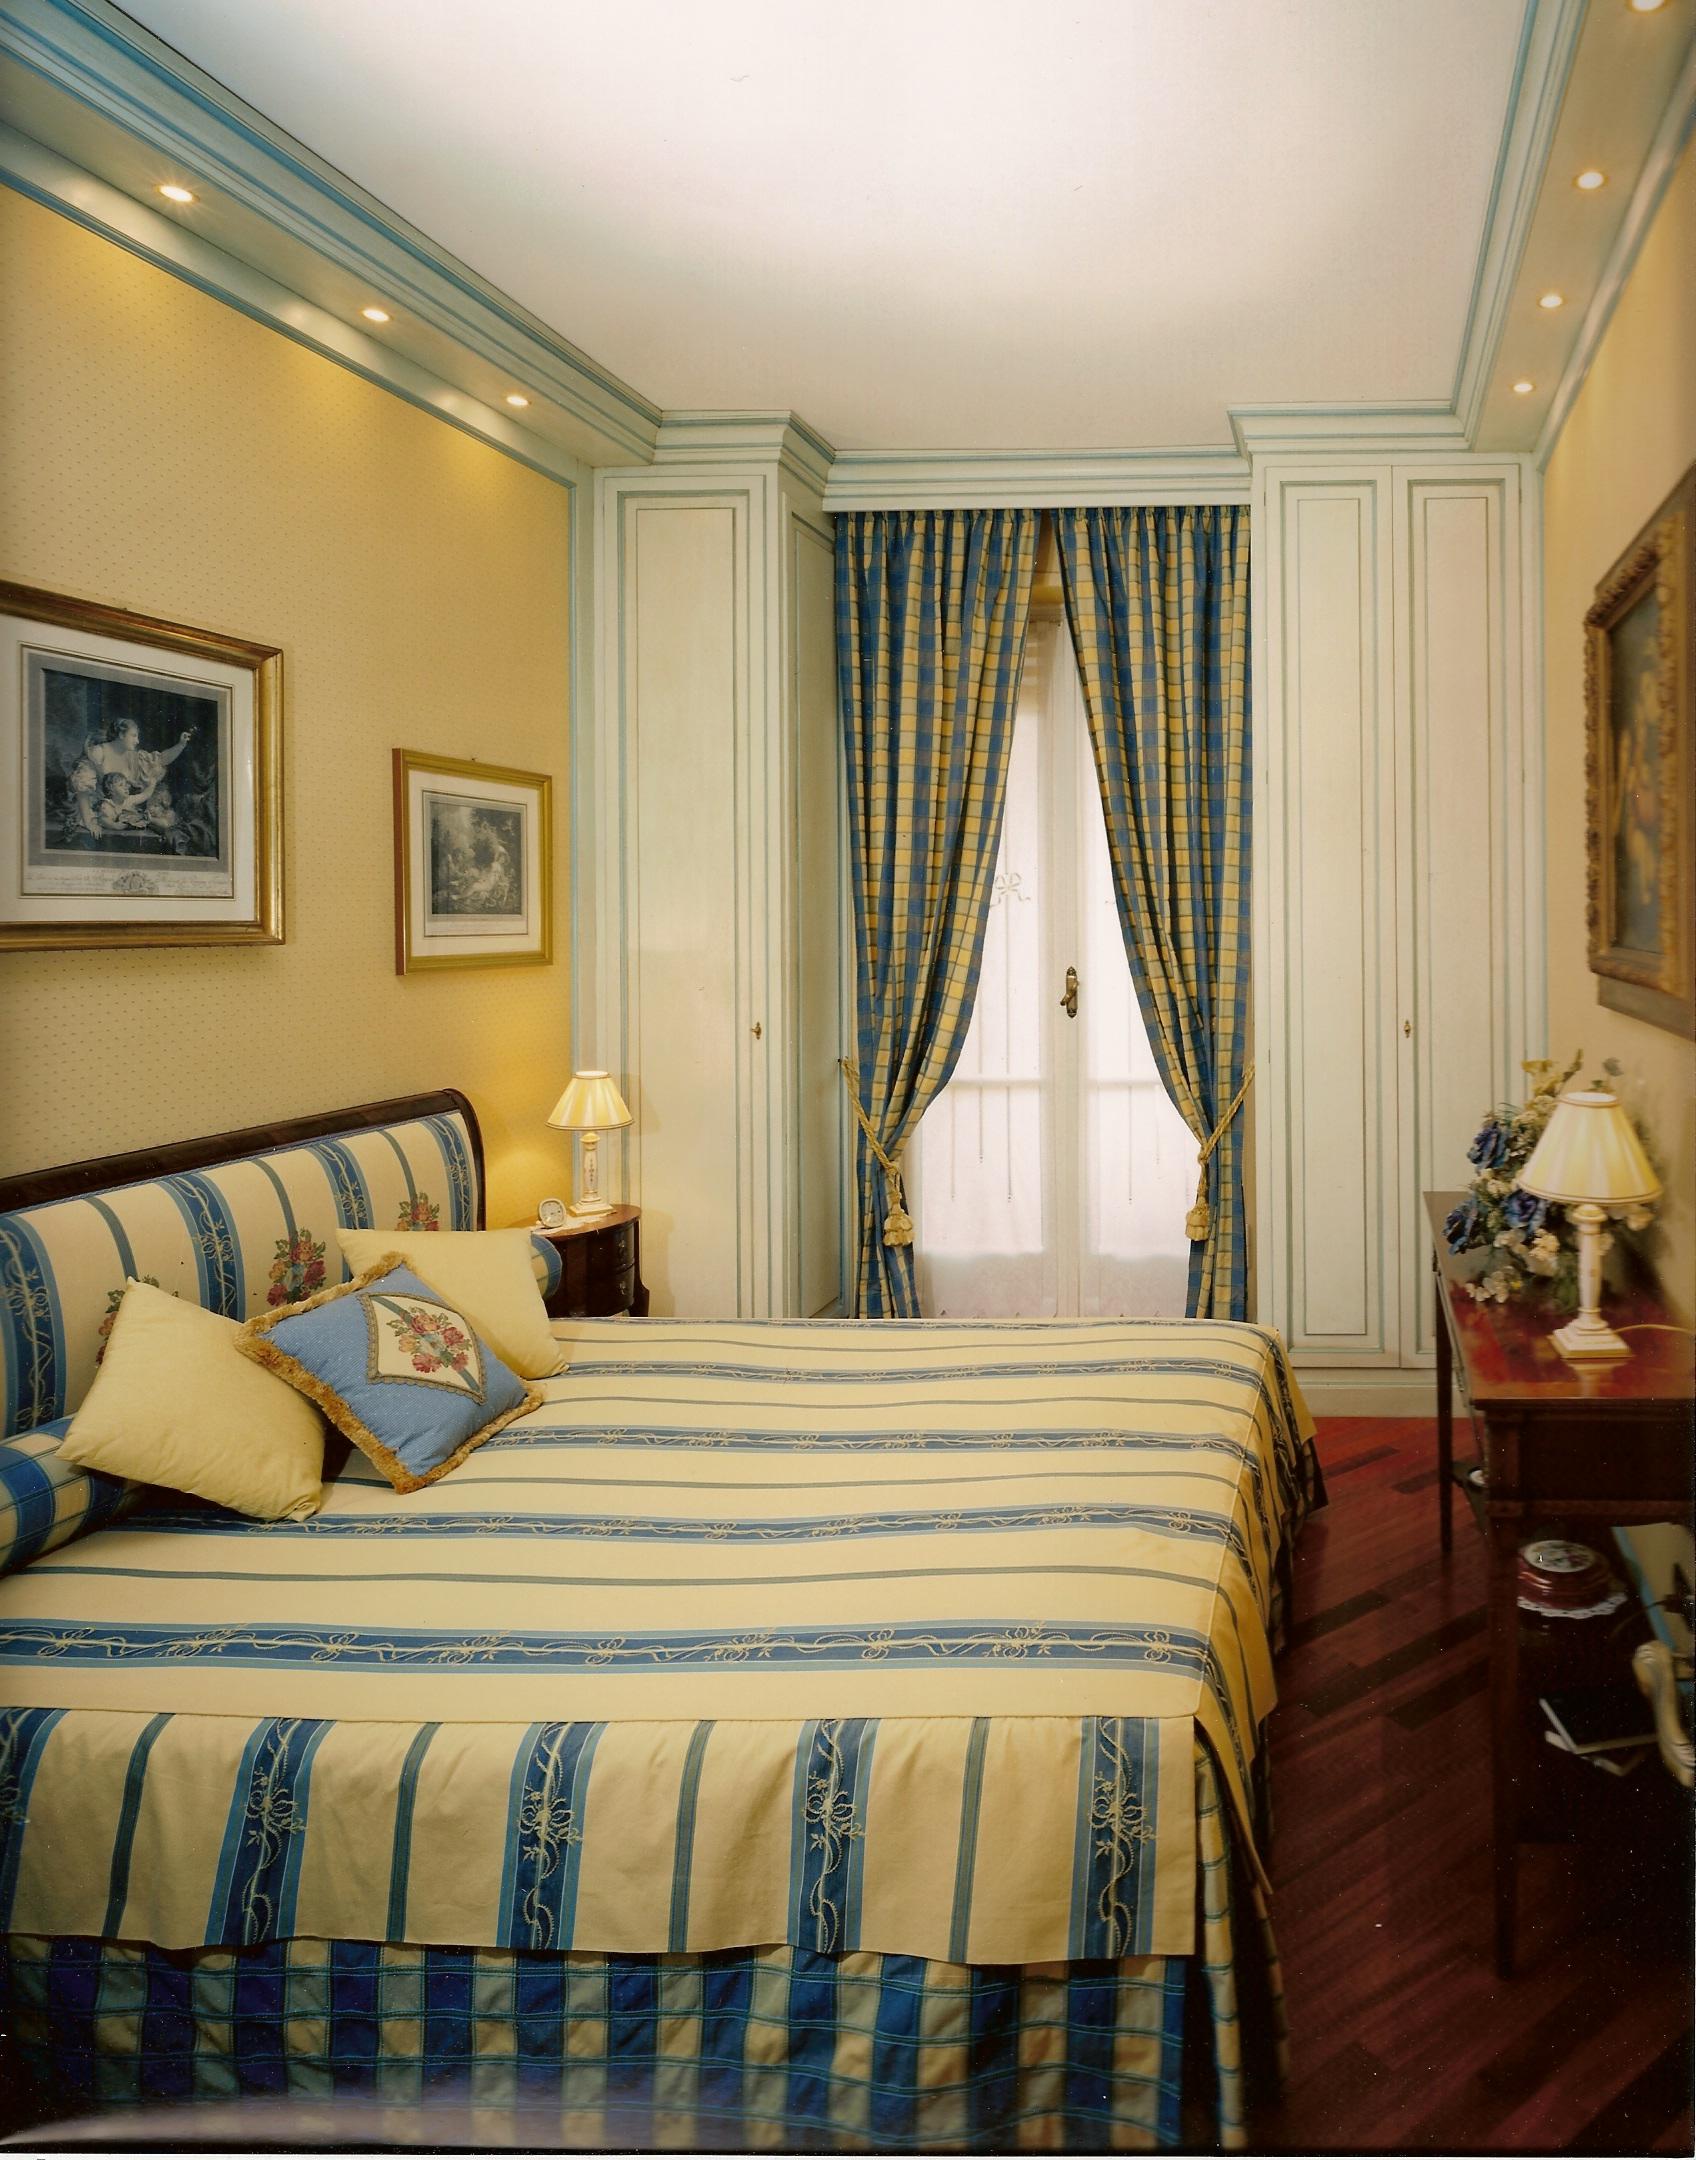 Hotel camera oscar dalan design for Dalan hotel